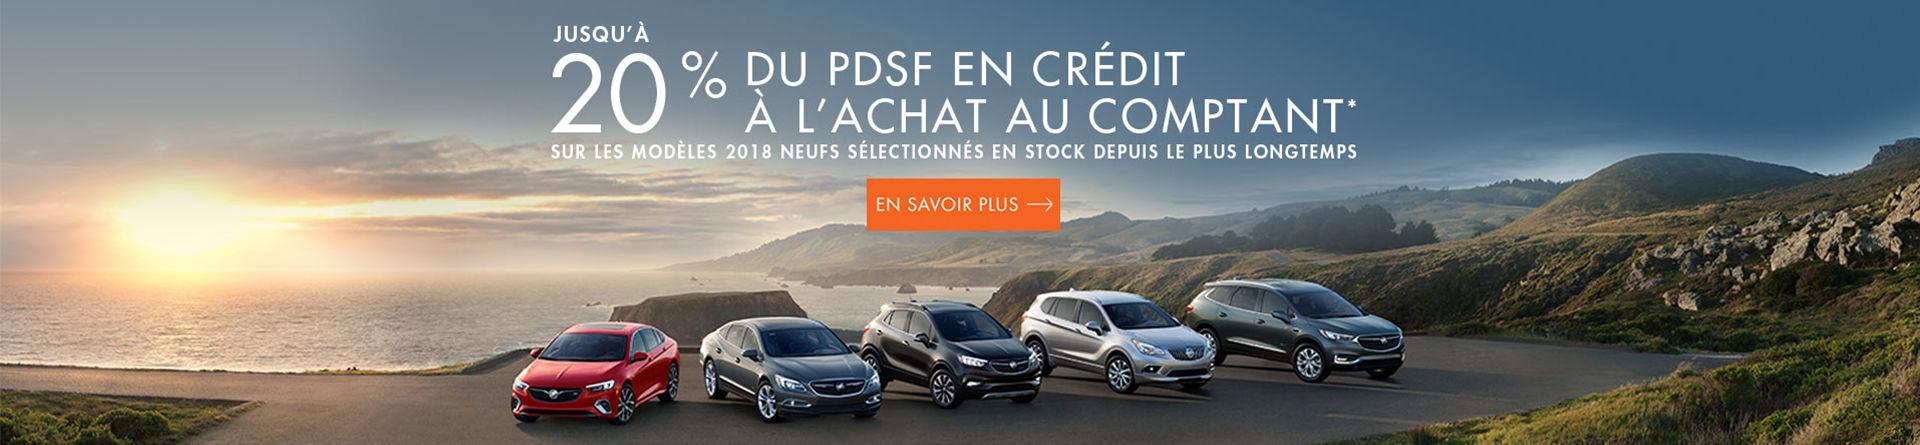 Buick Juillet 2018 REP